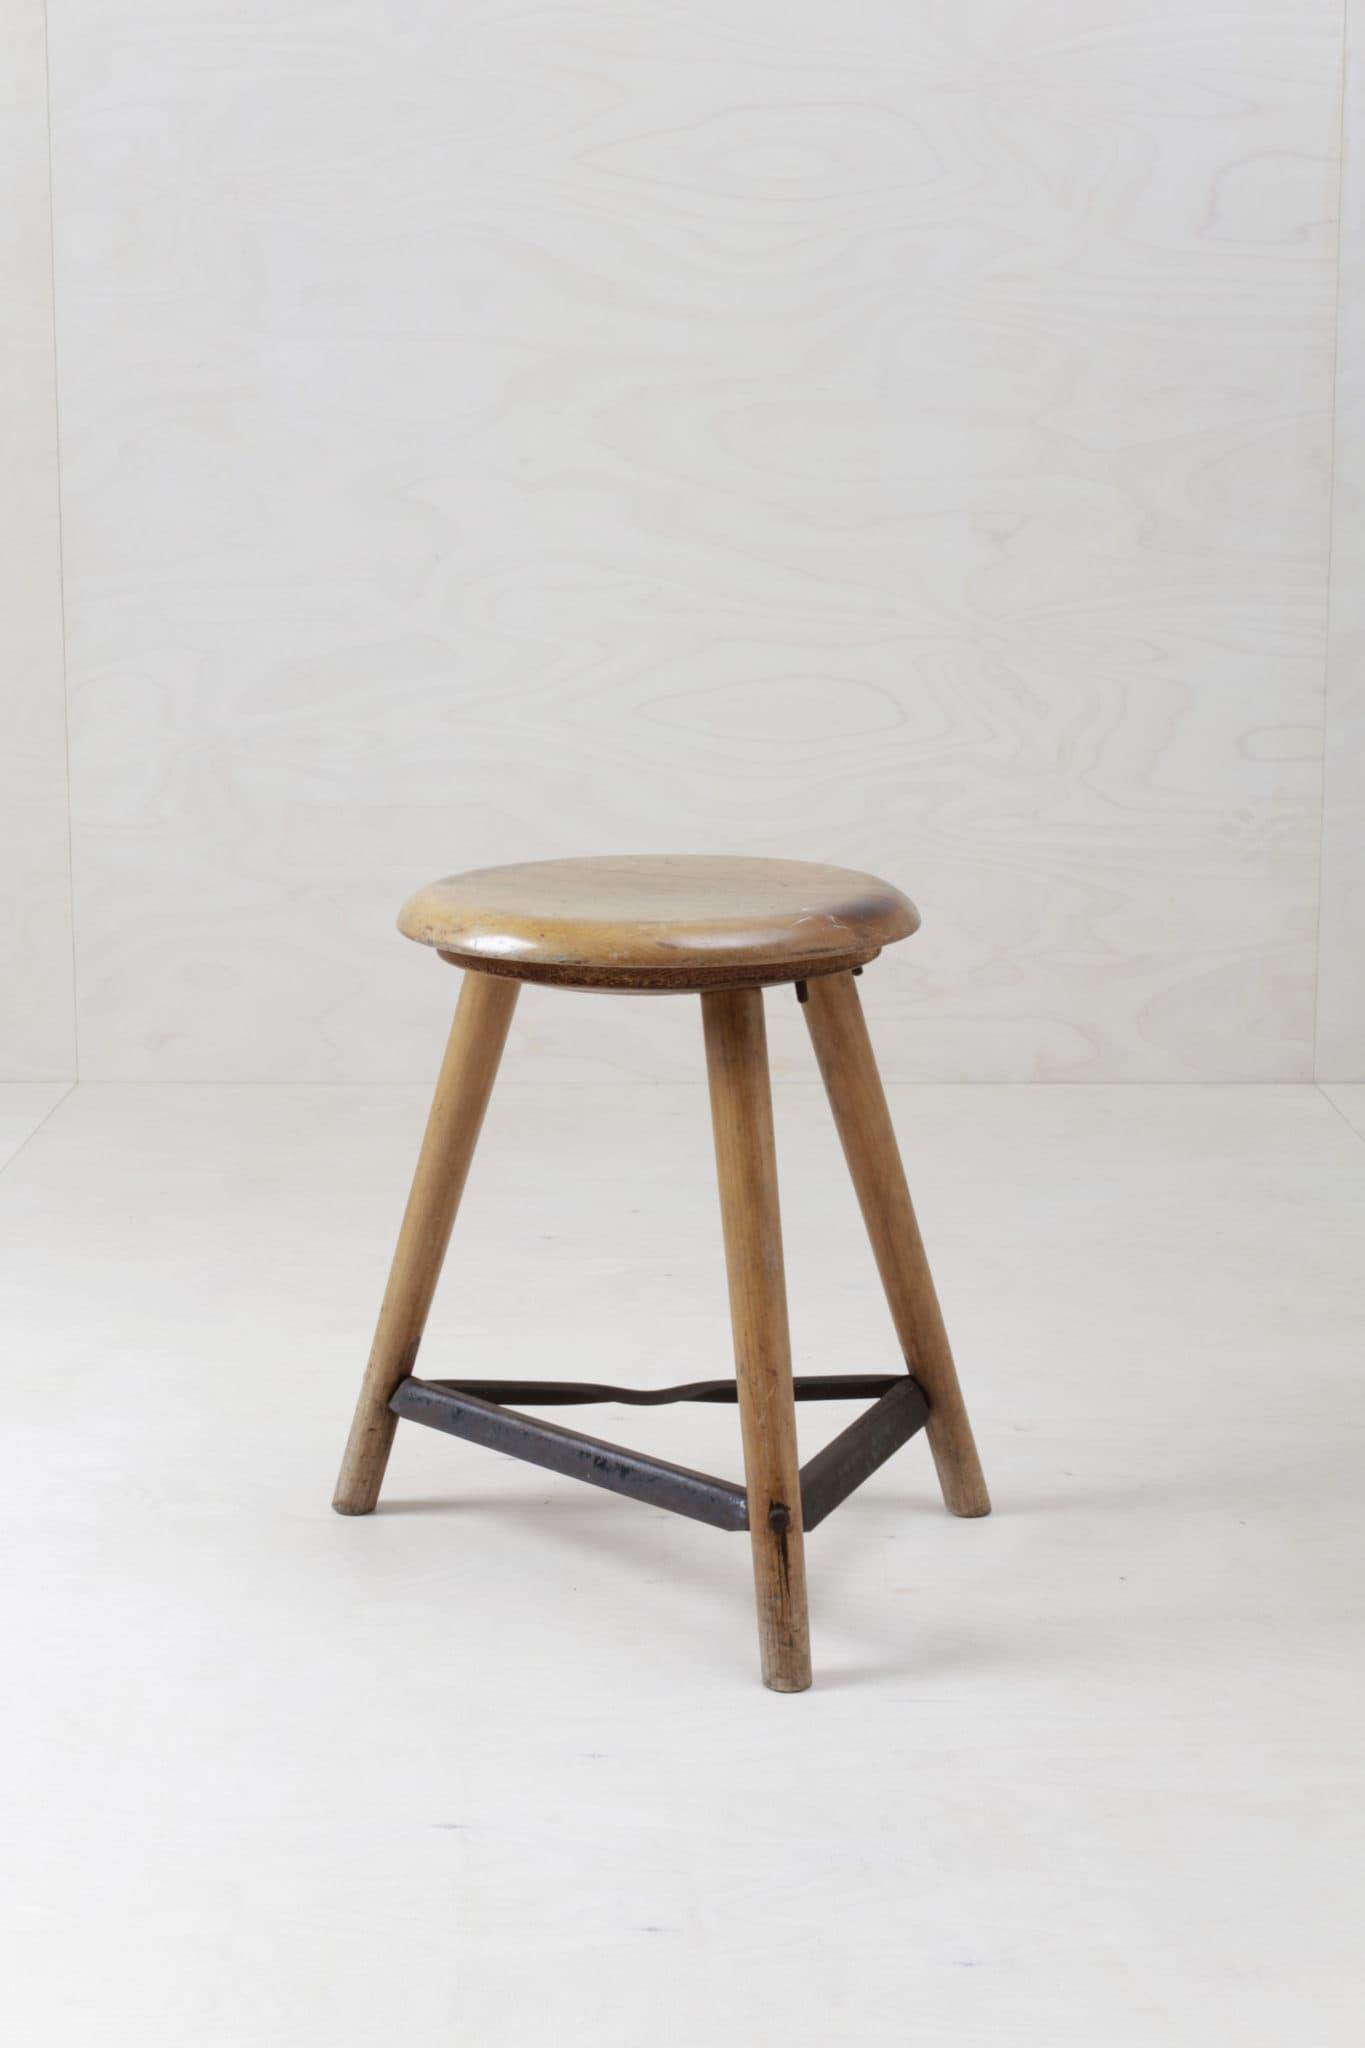 Mietmöbel, Vermietung, Holz Mobiliar, Holzhocker Vintage